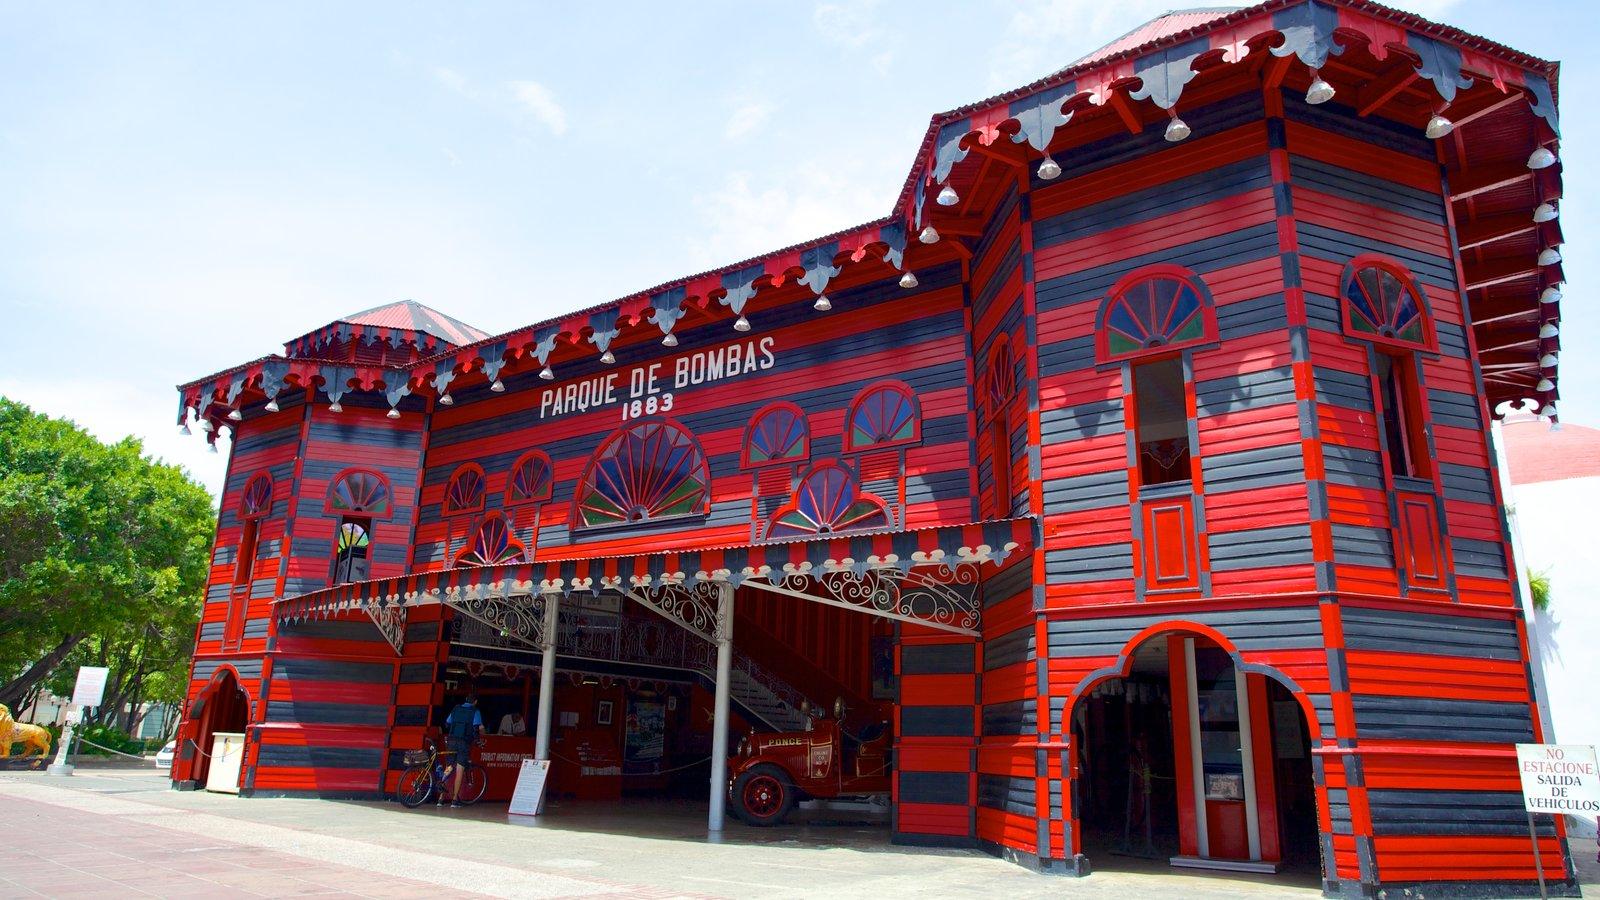 Parque de Bombas featuring street scenes